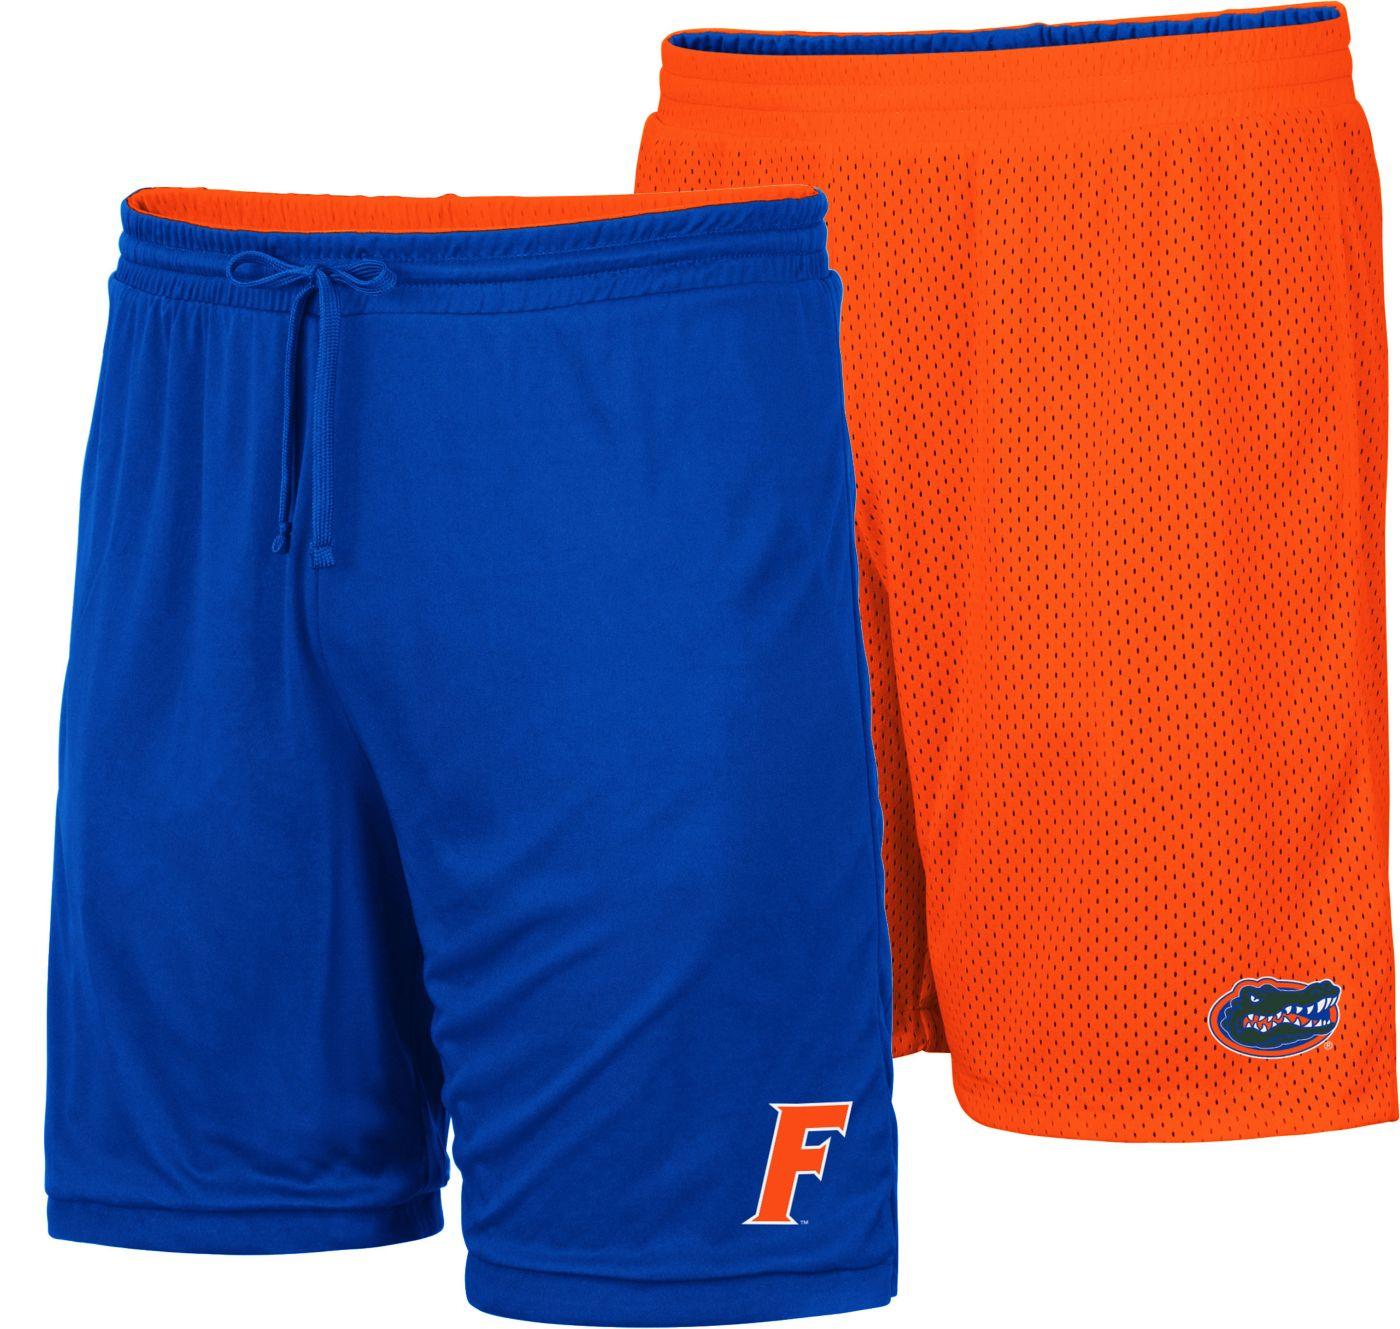 Colosseum Men's Florida Gators Blue/Orange Wiggum Reversible Shorts